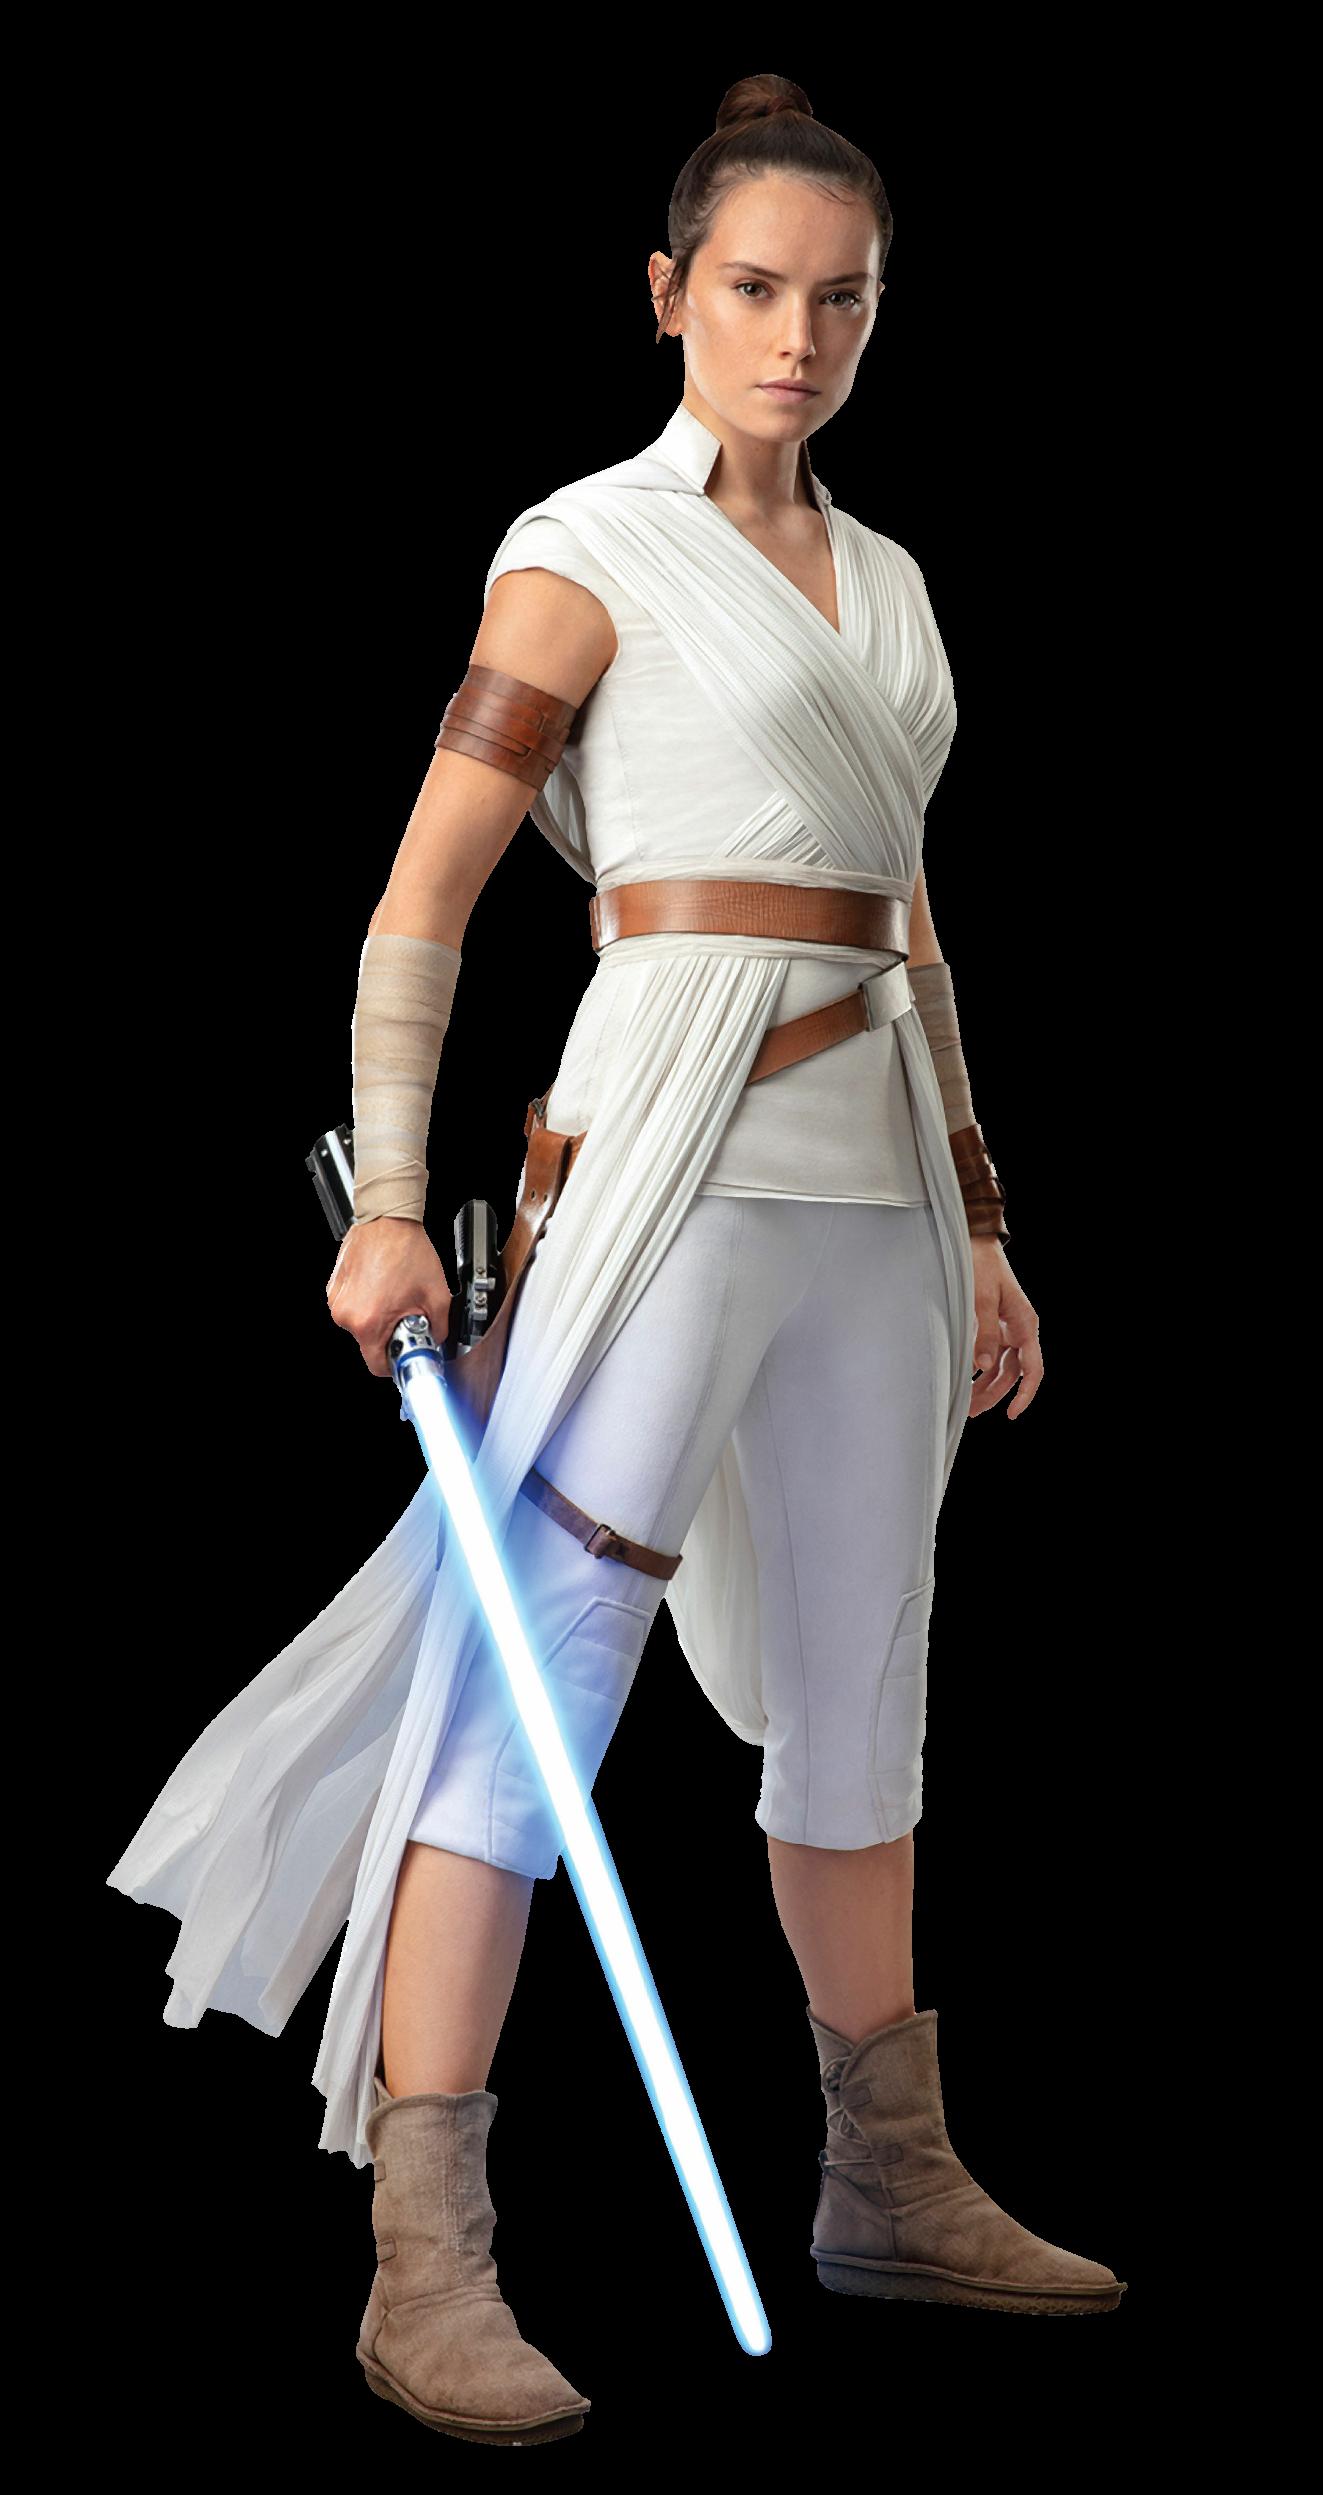 Star Wars Rise Of Skywalker Resistance Trooper Png By Metropolis Hero1125 On Deviantart Finn Star Wars Star Wars Outfits Leia Star Wars Star Wars Costumes